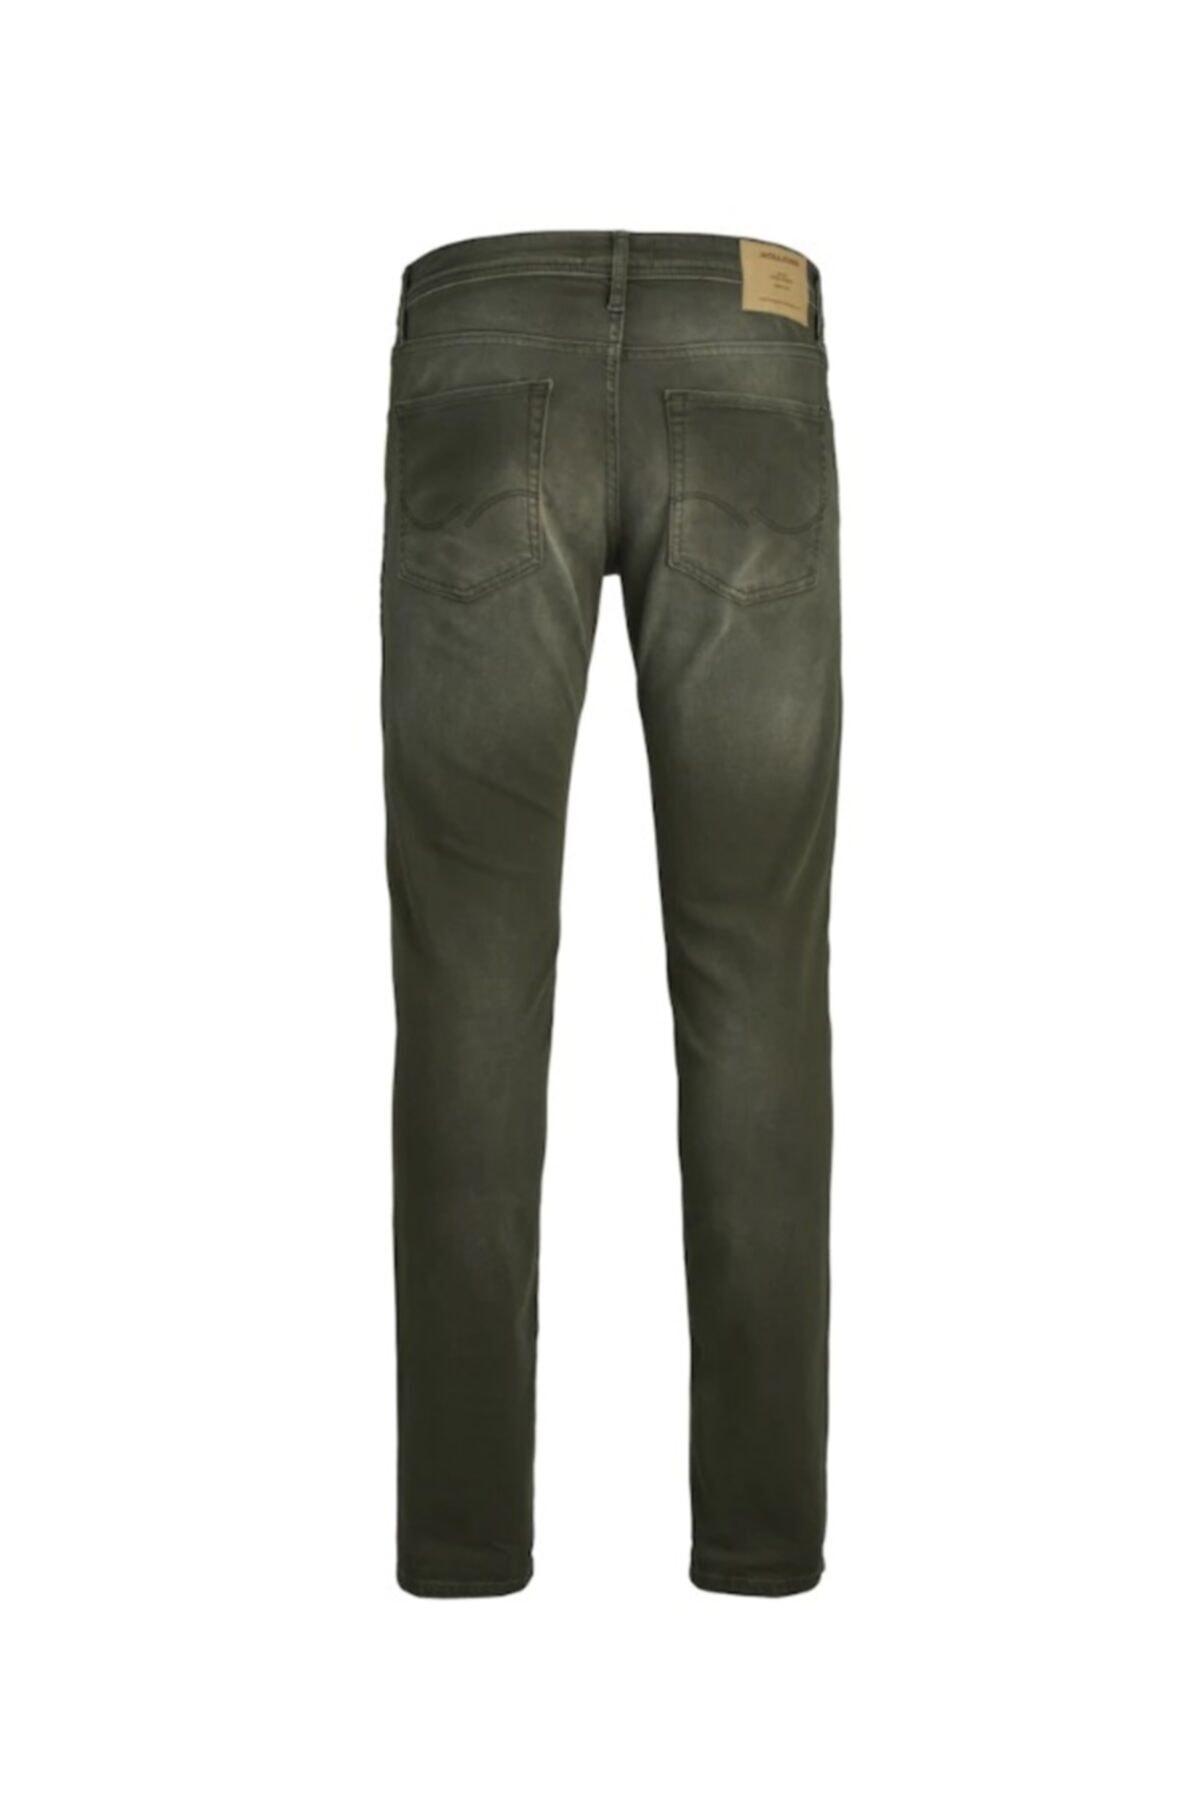 Jack & Jones Jack Jones Erkek Glenn Model Haki Renk Kot Pantolon 12163928 2